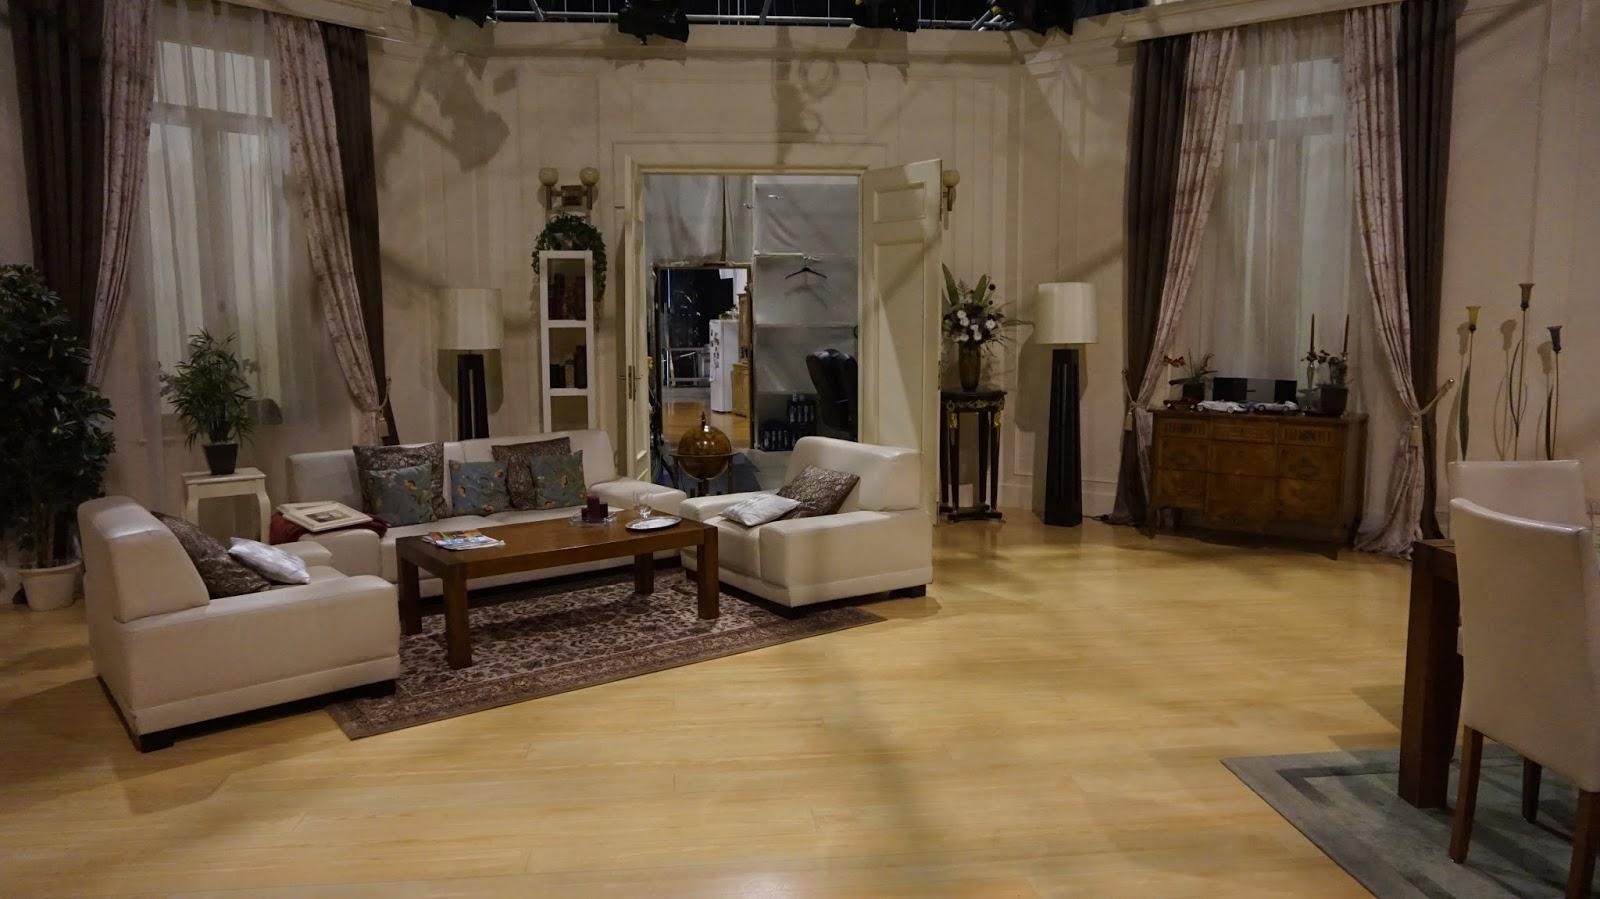 video sturm der liebe studiof hrung f rstenhof mit isabella h bner anderswohin. Black Bedroom Furniture Sets. Home Design Ideas